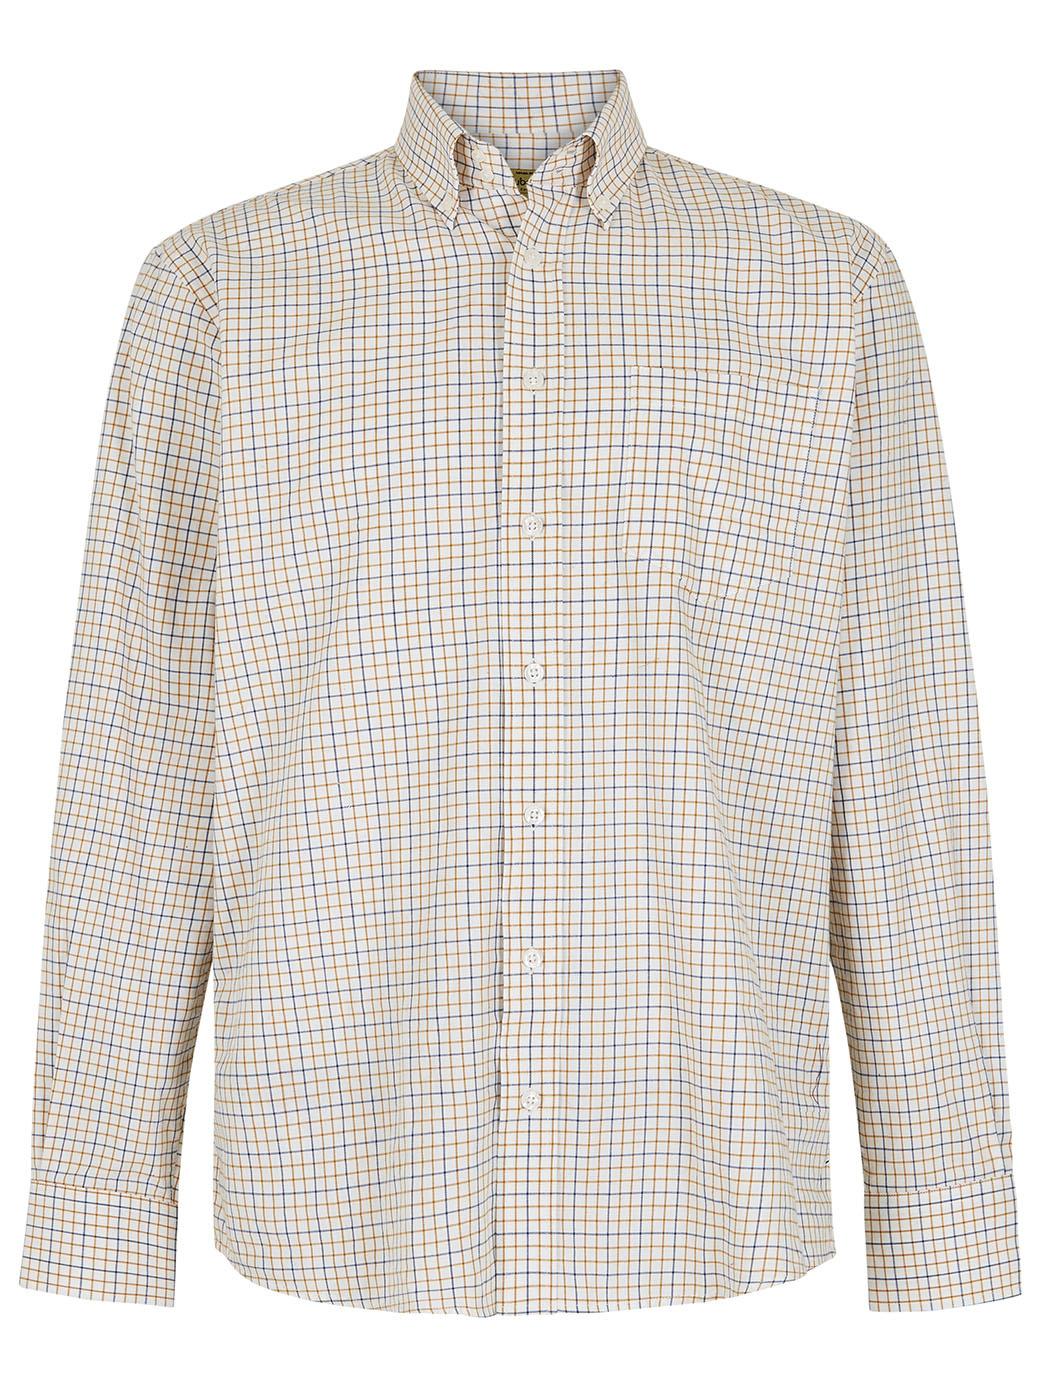 Dubarry Muckross Tattersall Shirt - Harvest-1